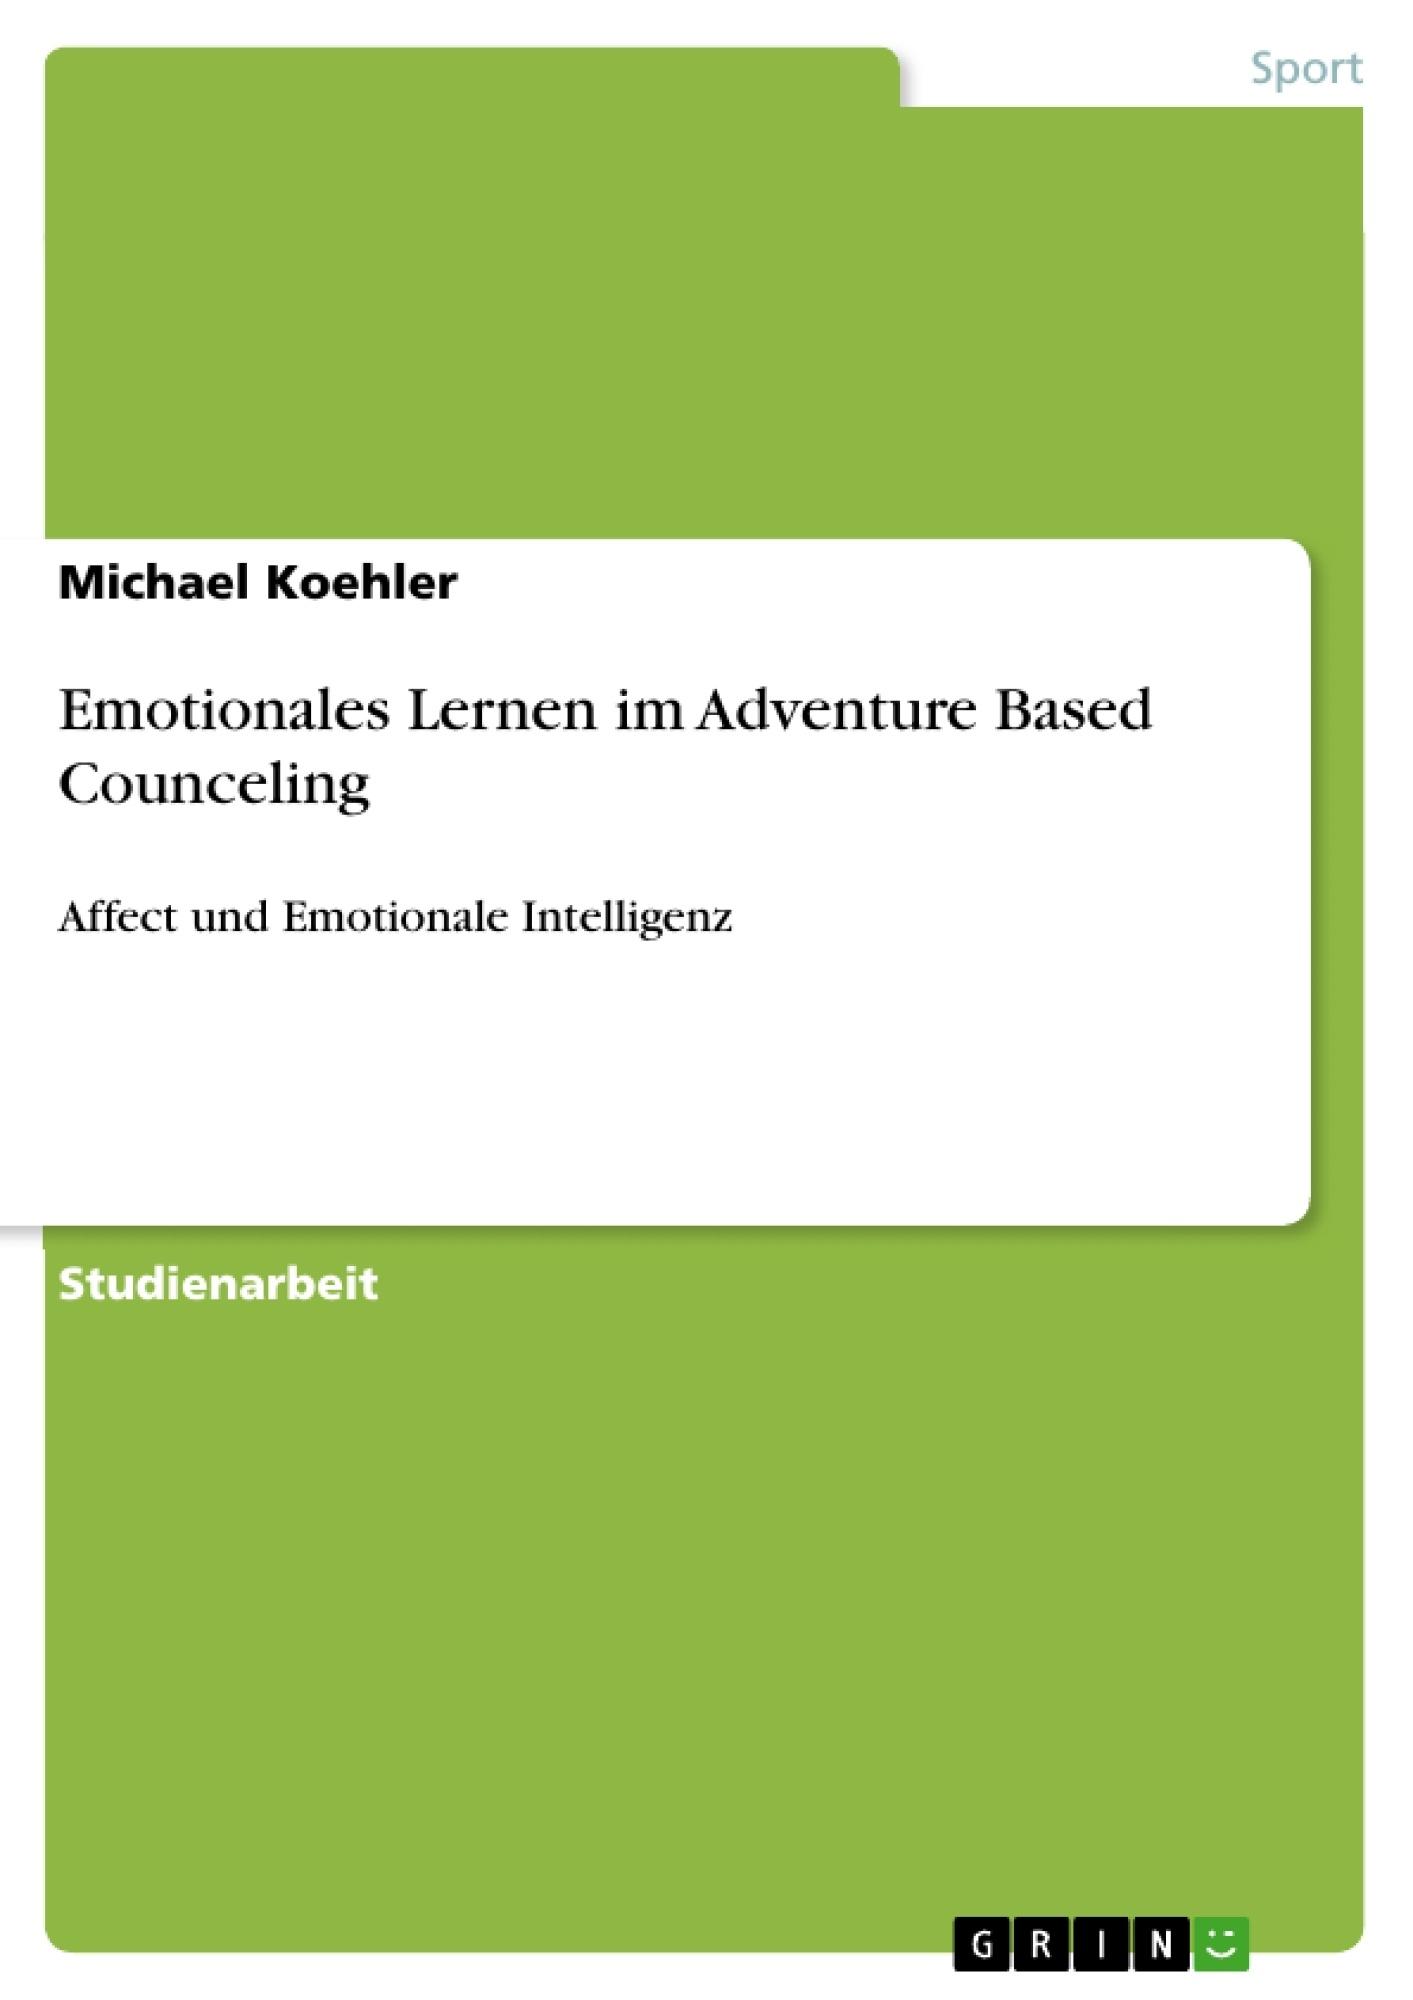 Titel: Emotionales Lernen im Adventure Based Counceling